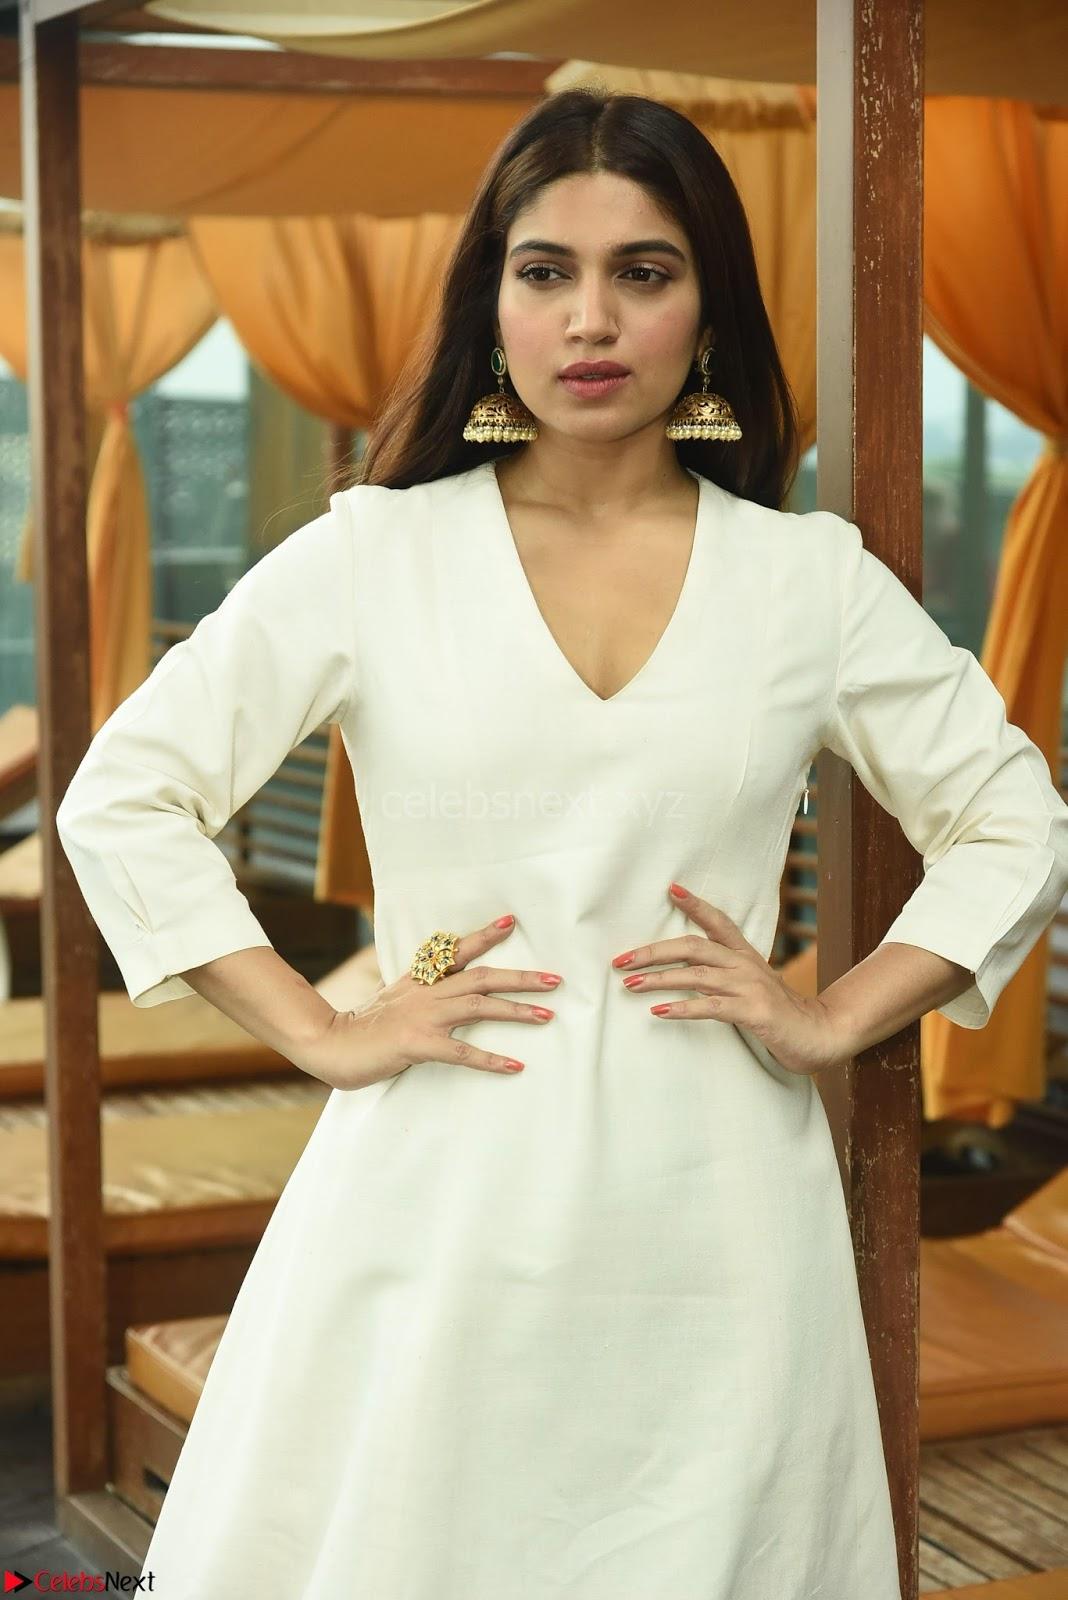 Bhumi Pednekar Looks super cute promoting her movie Toilet Ek Prem Katha